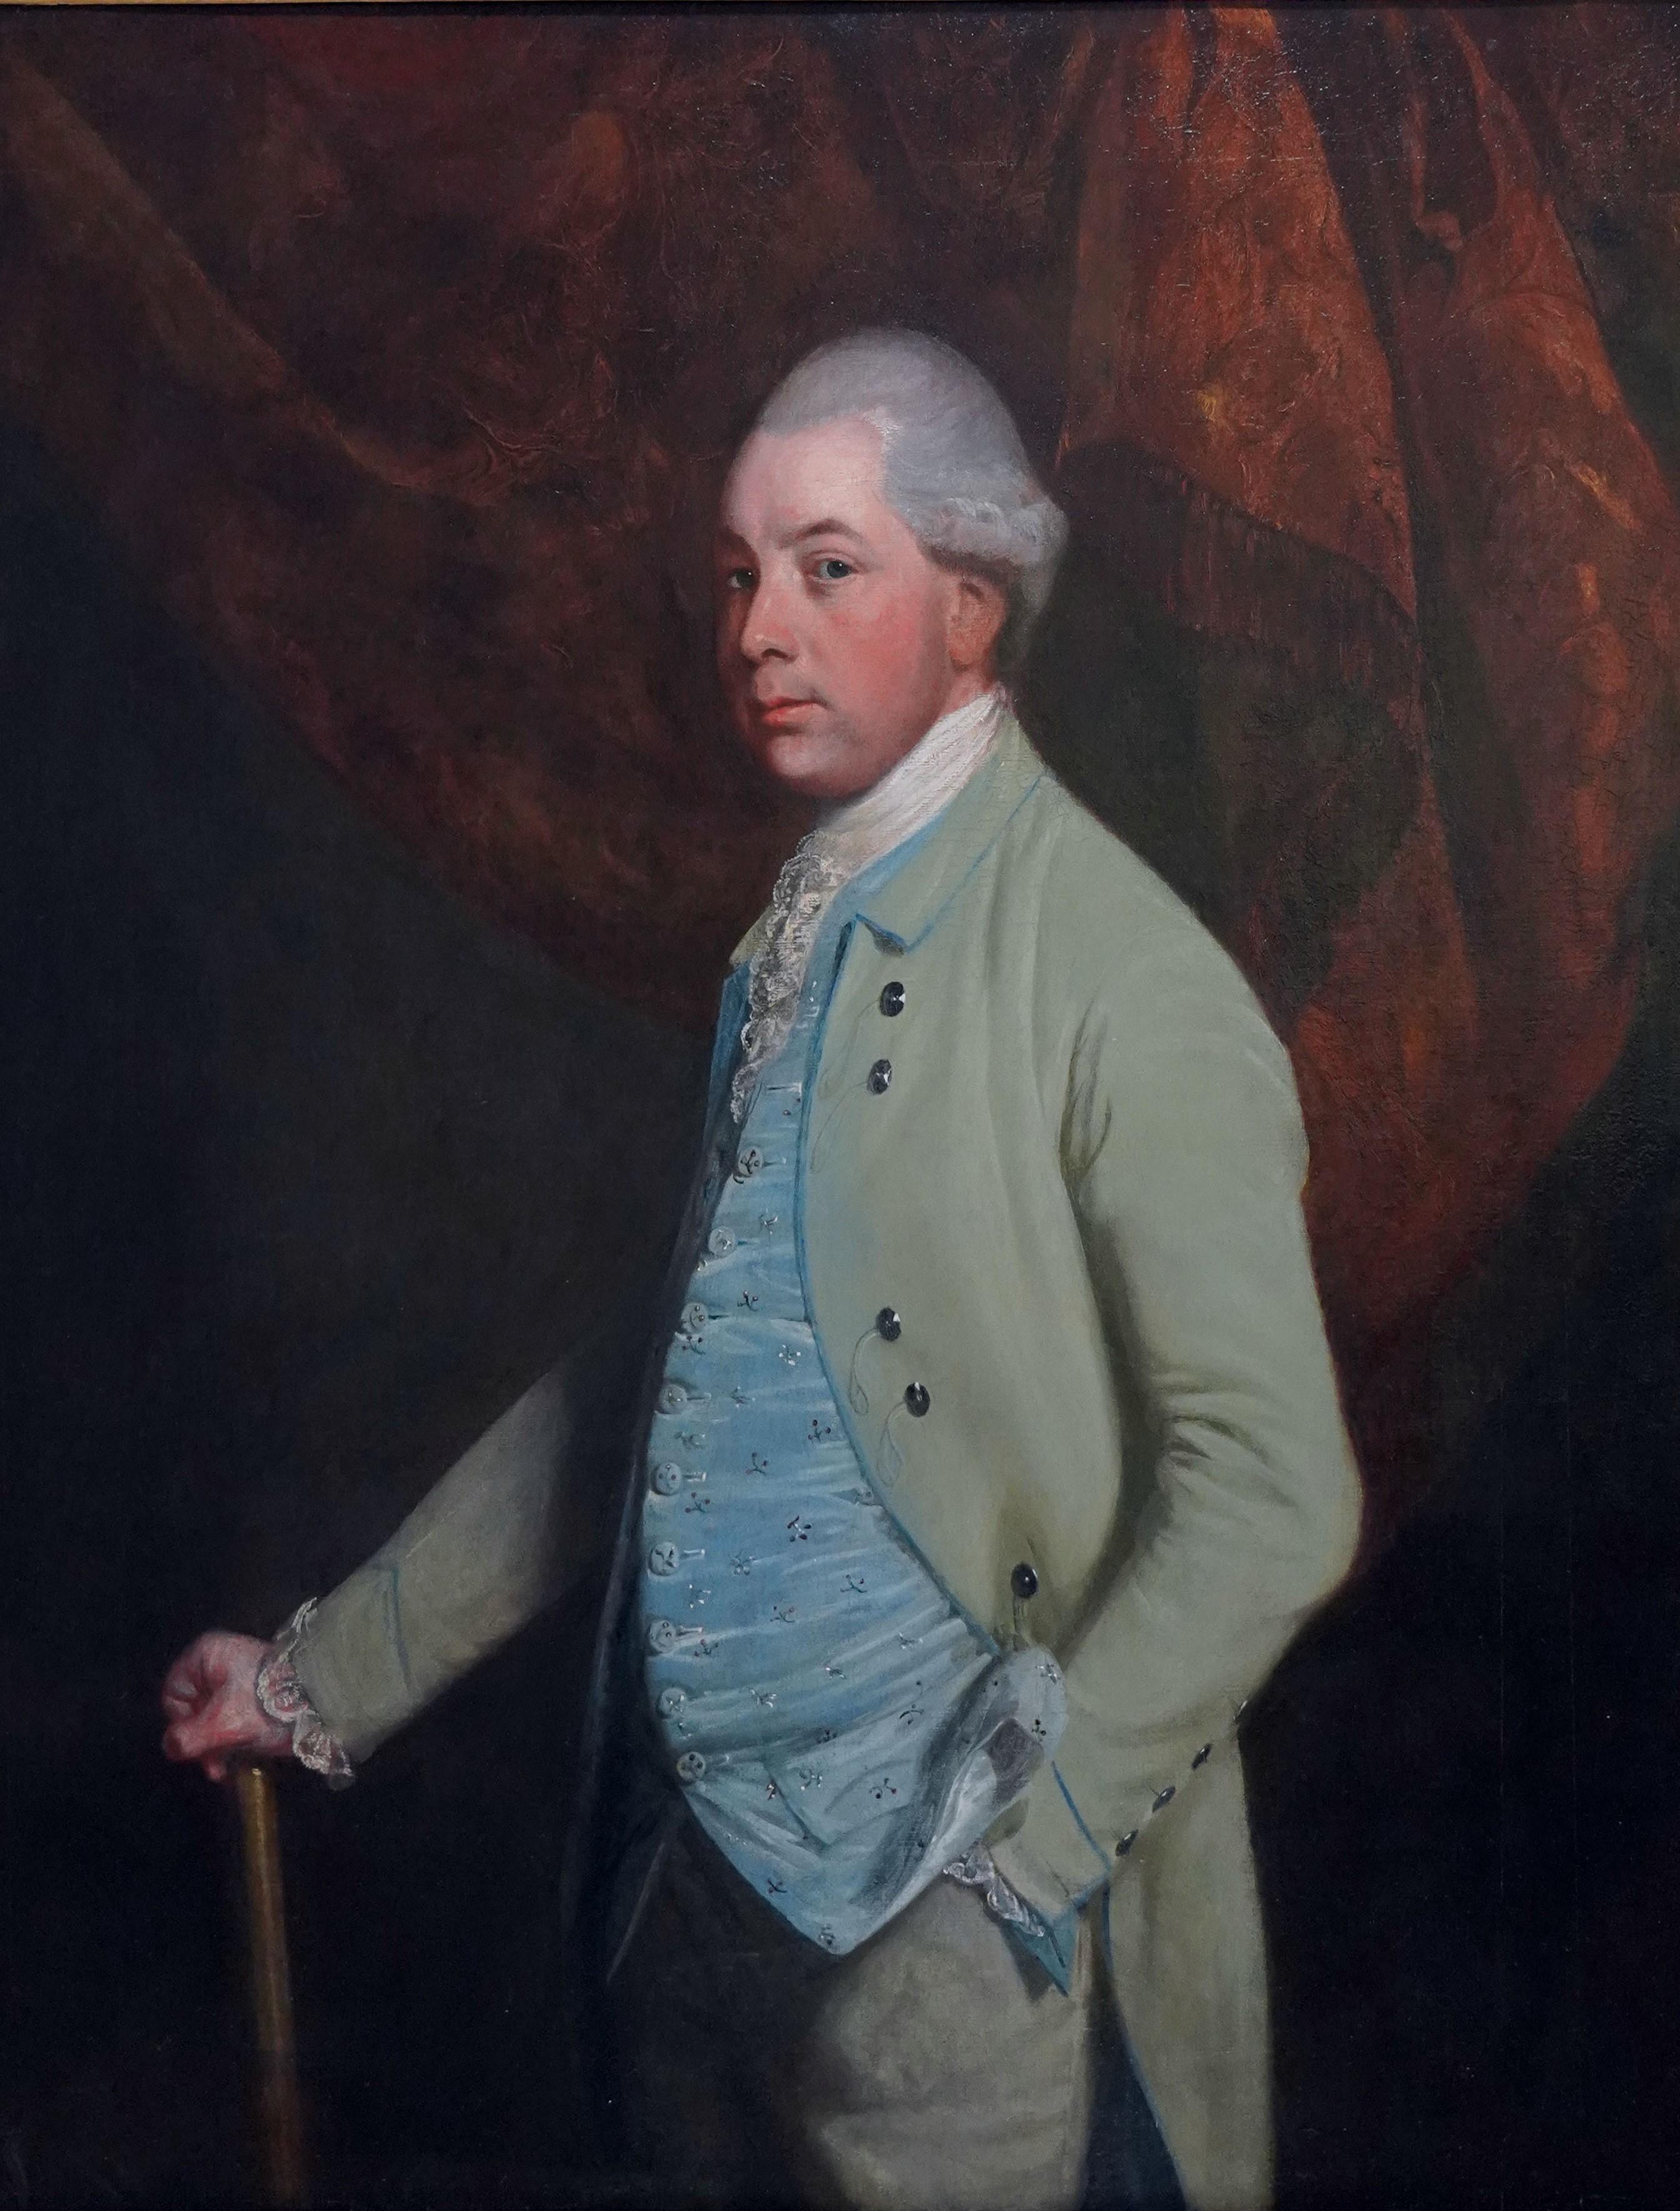 18th century portrait of William Craven, 6th Baron Craven